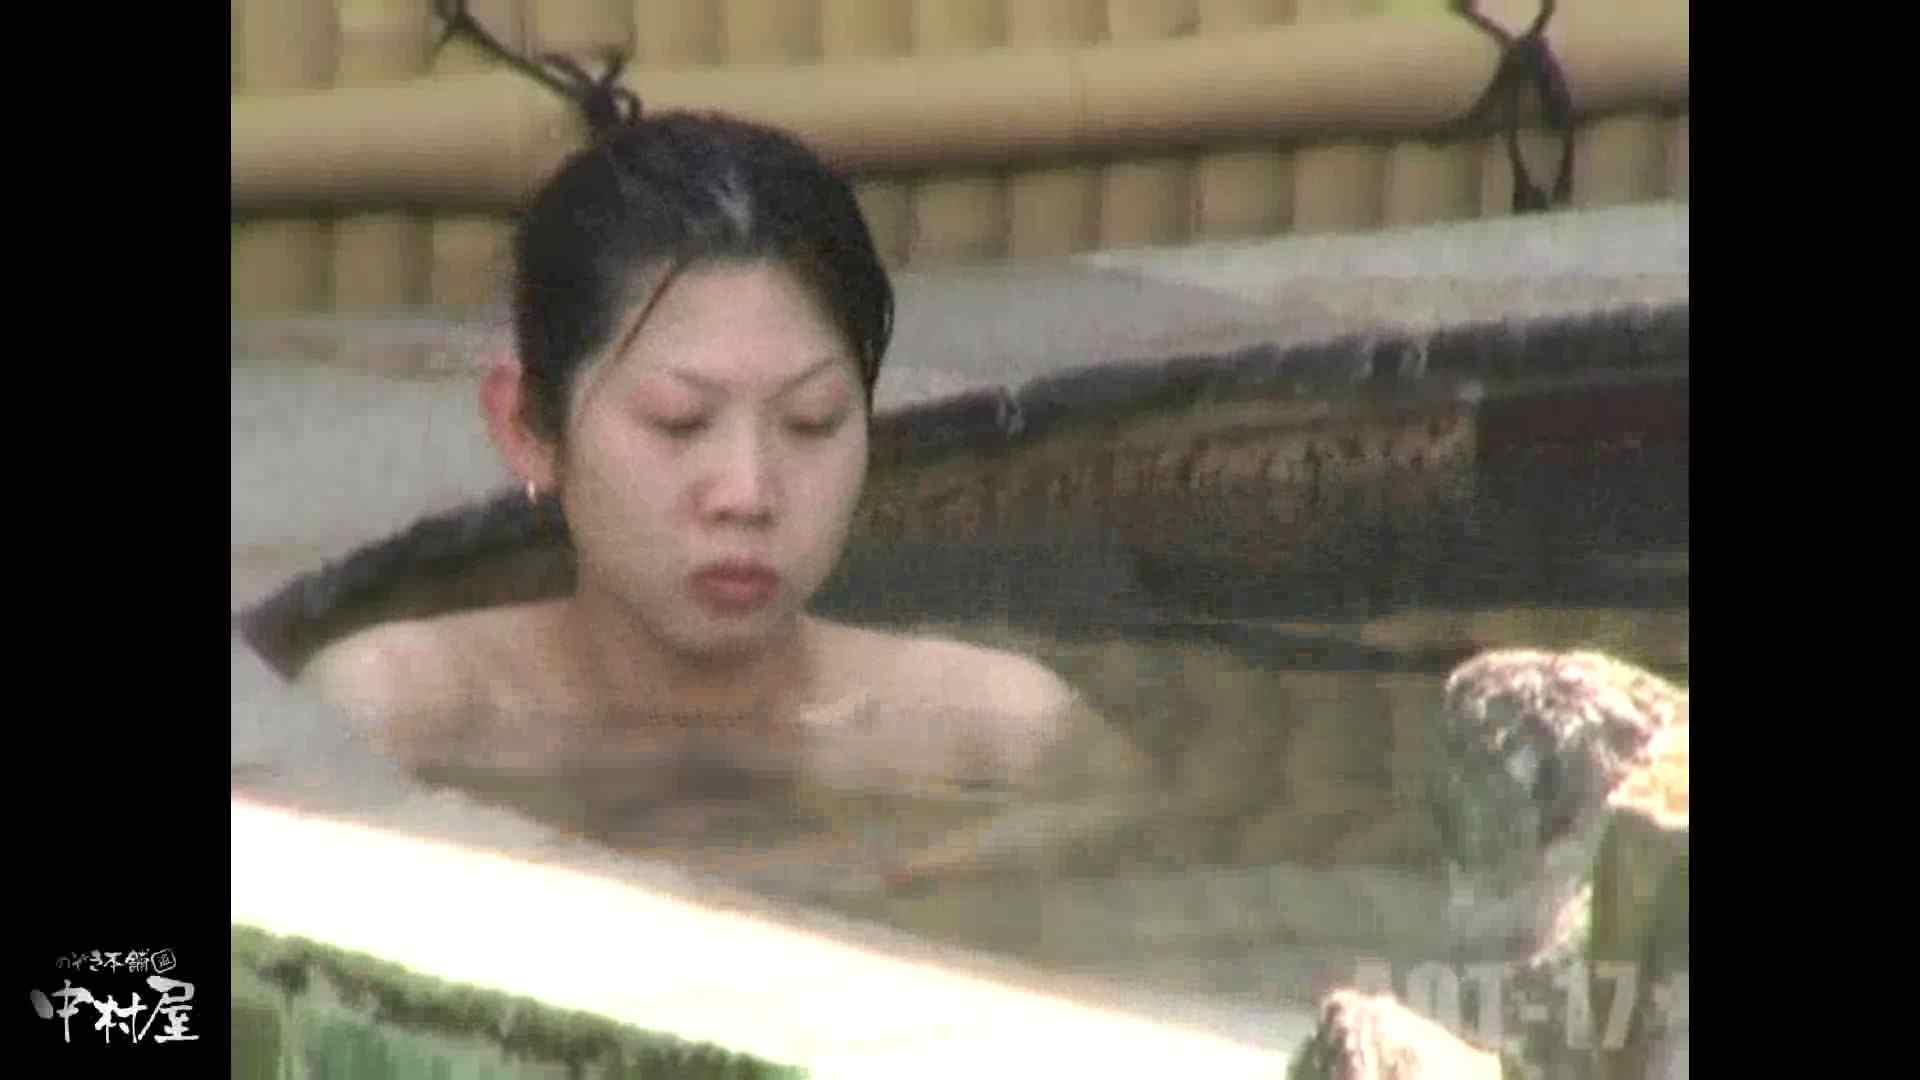 Aquaな露天風呂Vol.881潜入盗撮露天風呂十七判湯 其の三 OLセックス  72画像 72